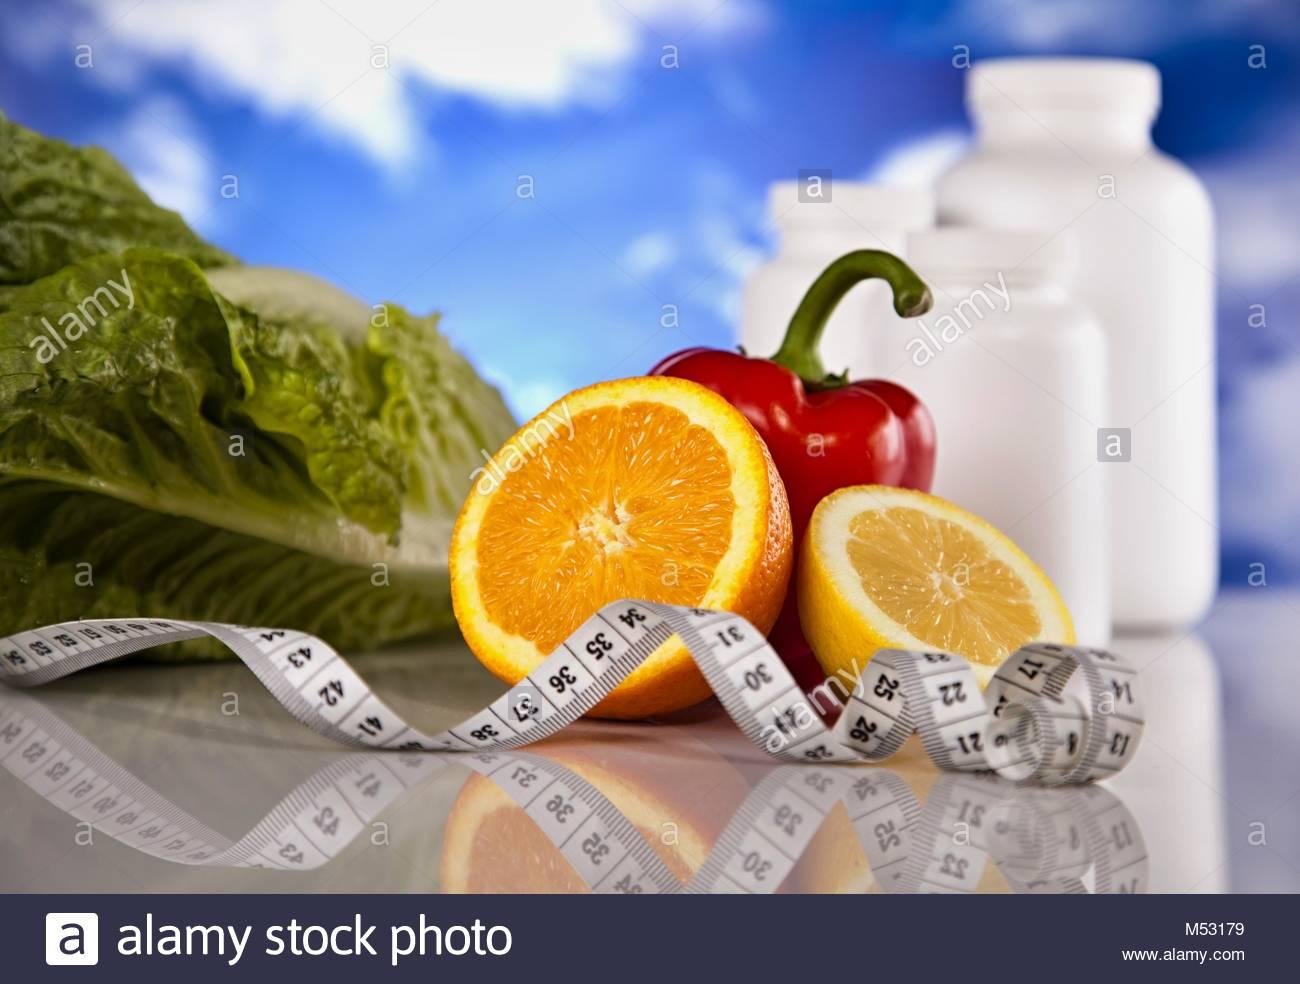 Living healthy Stock Photo